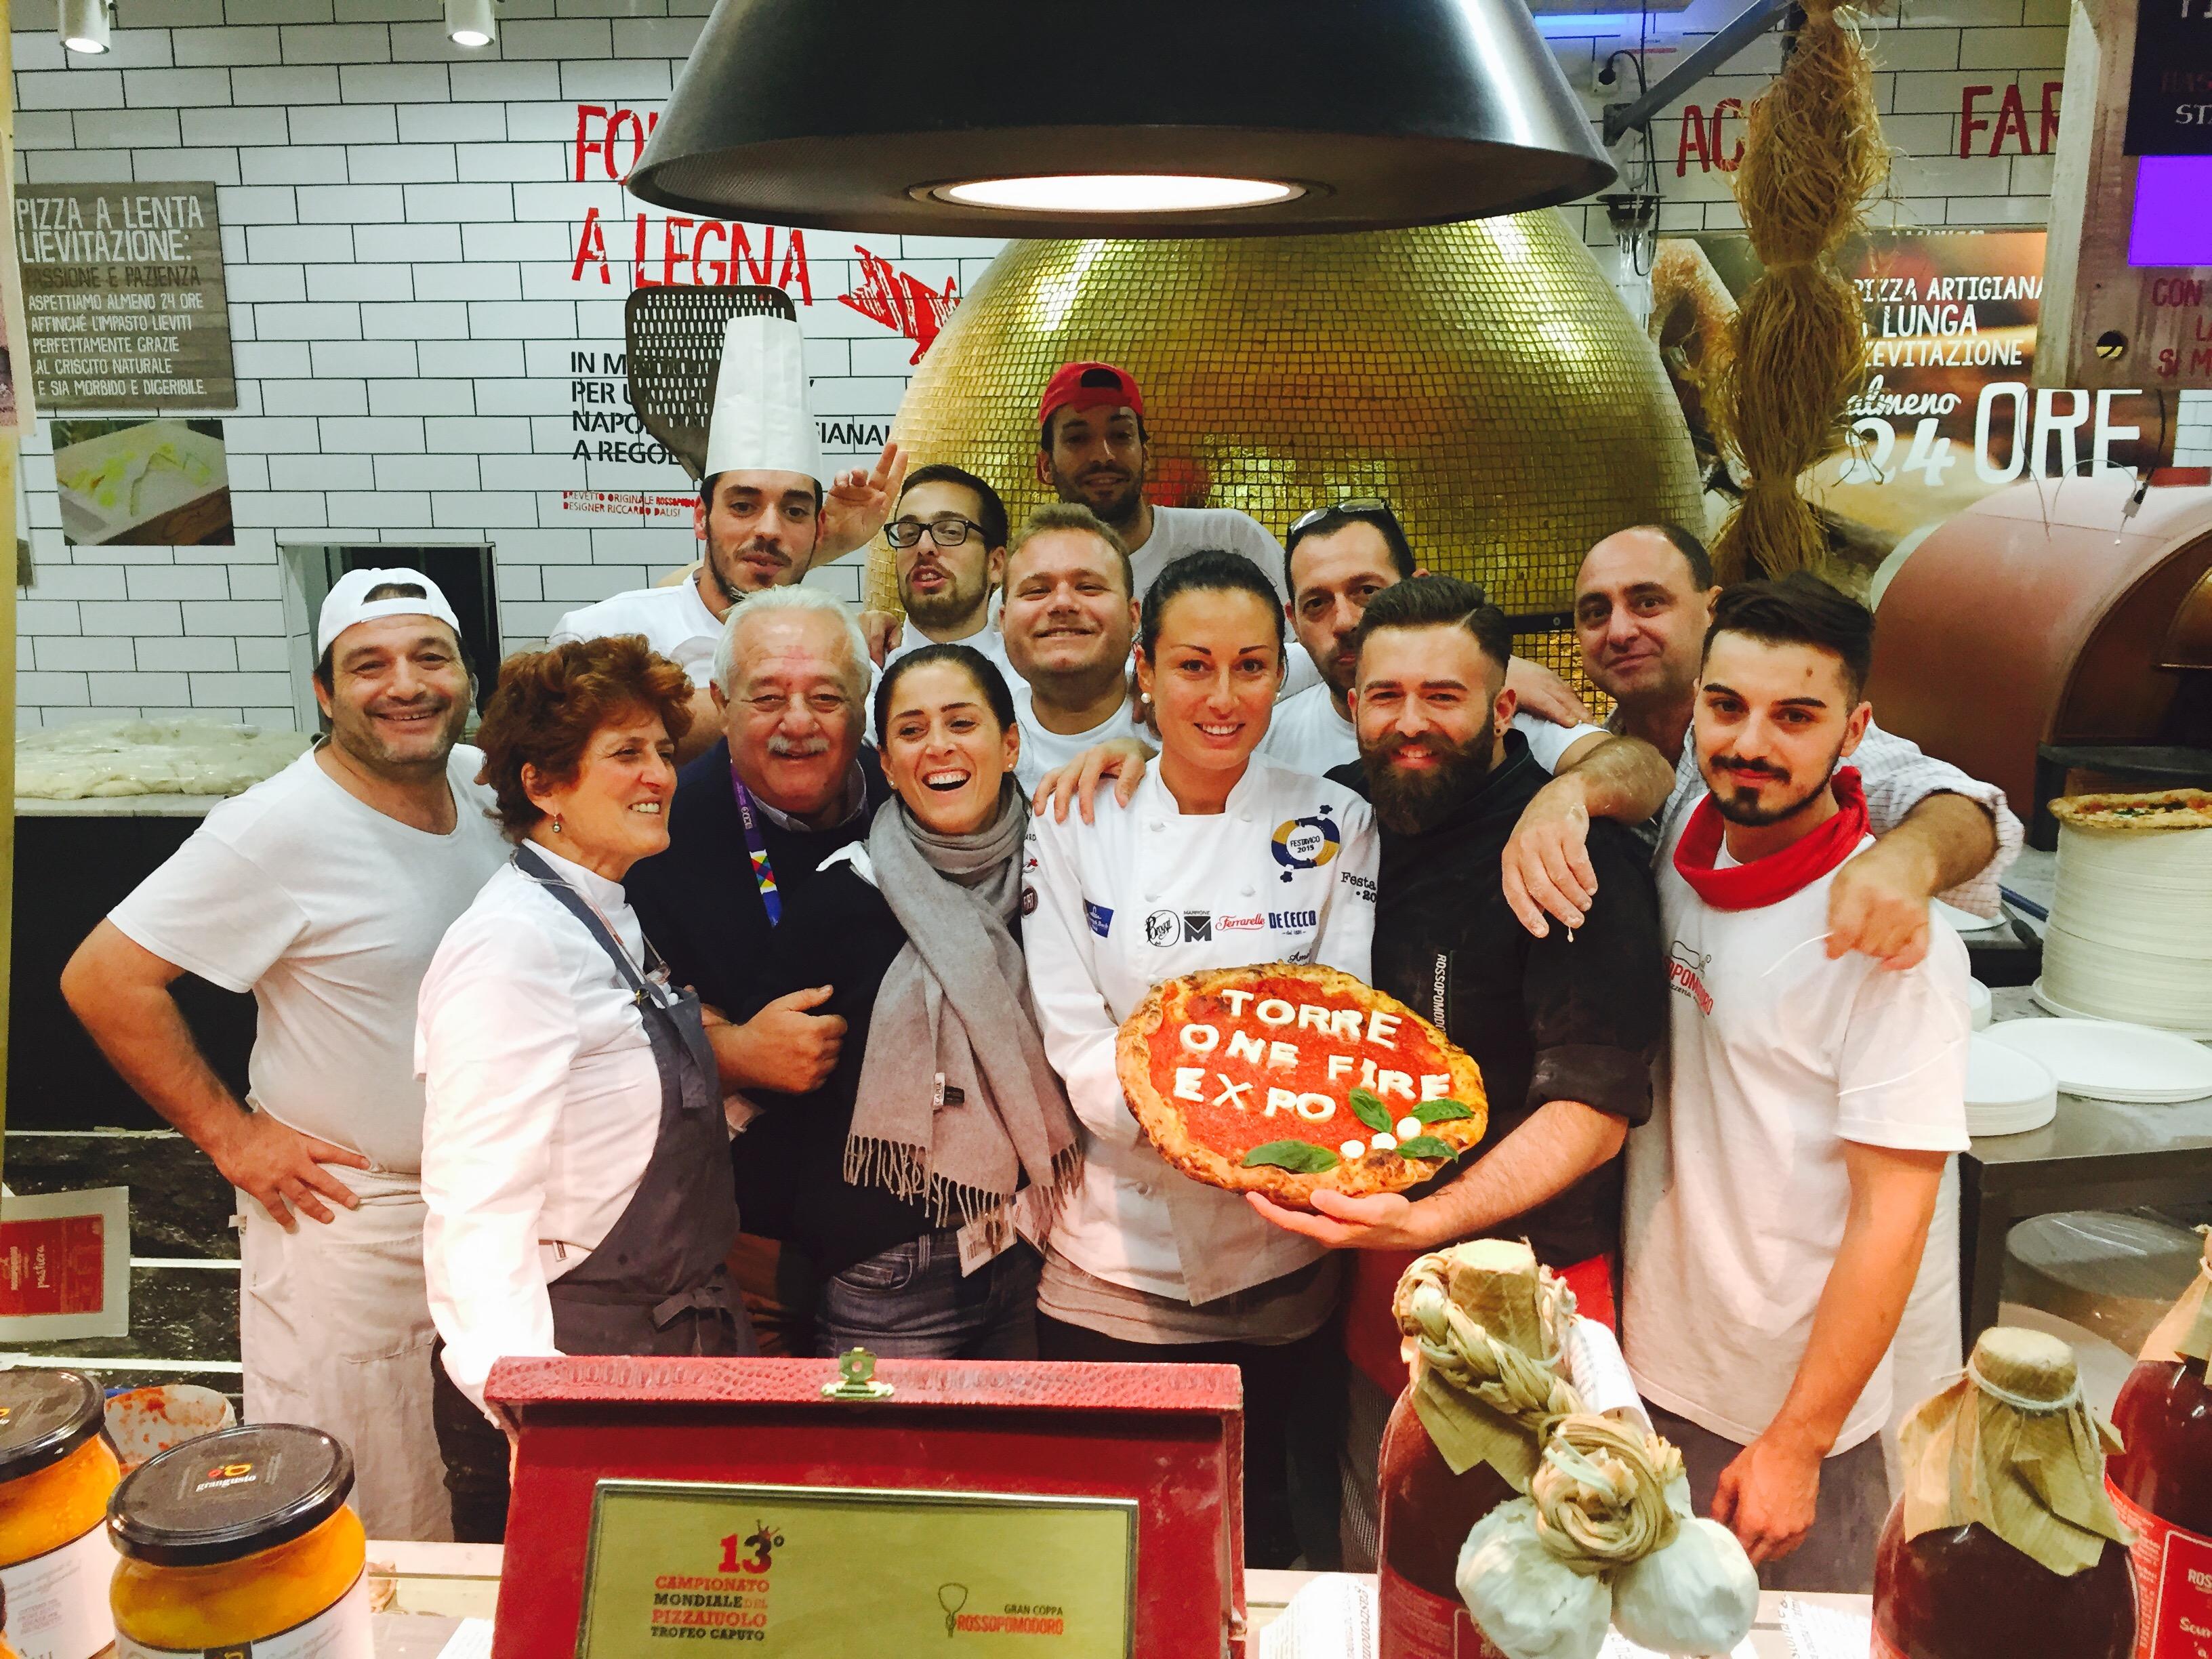 Eataly Expo Rossopomodoro e Torre